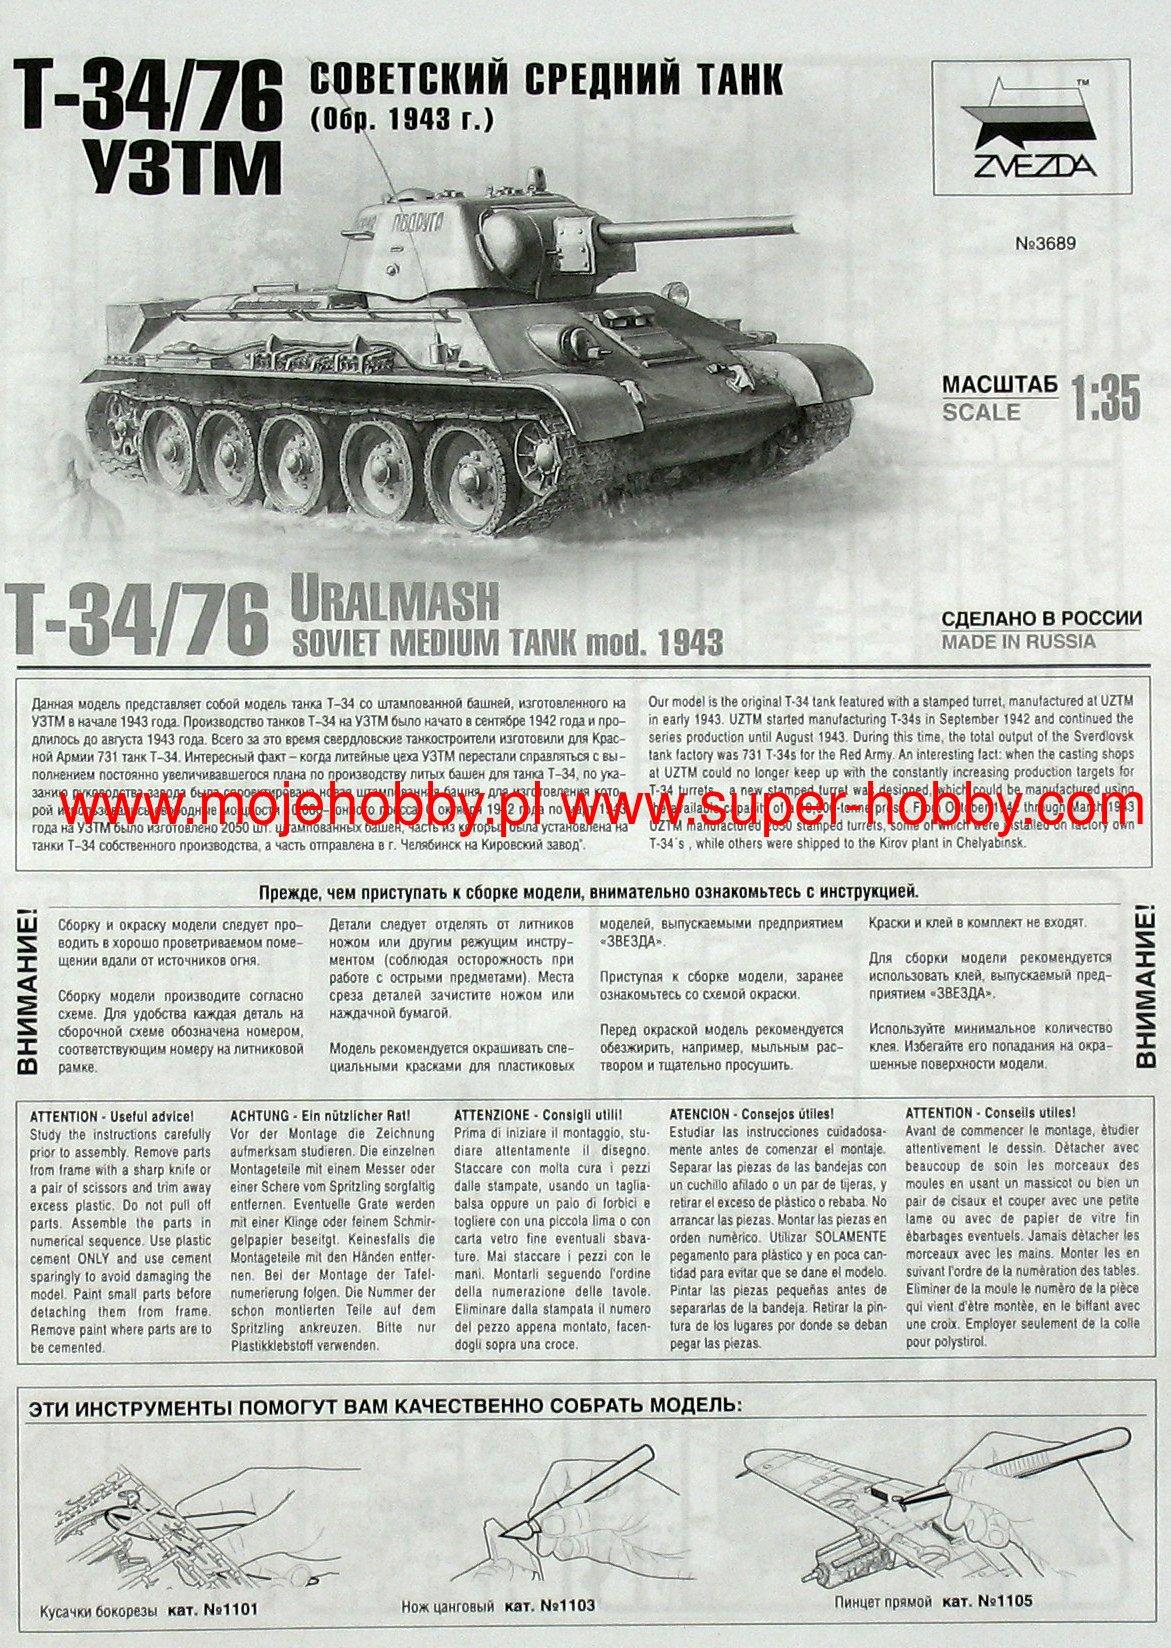 Neu Zvezda 3689-1//35 T-34//76 mod 1943 Uralmash